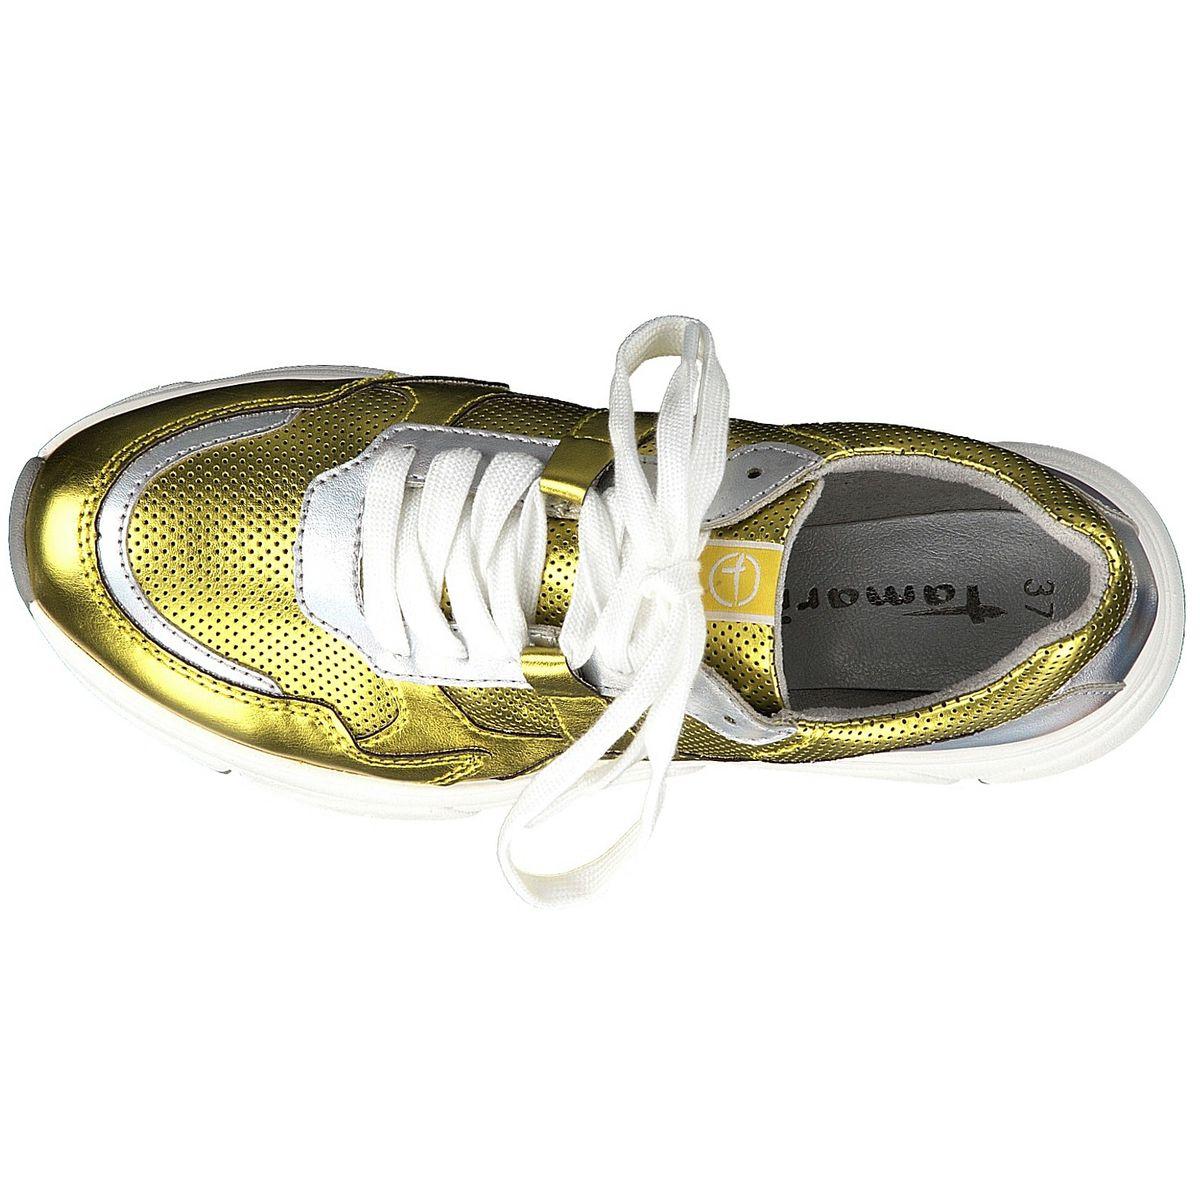 TAMARIS Damen Sneaker Gelb Metallic